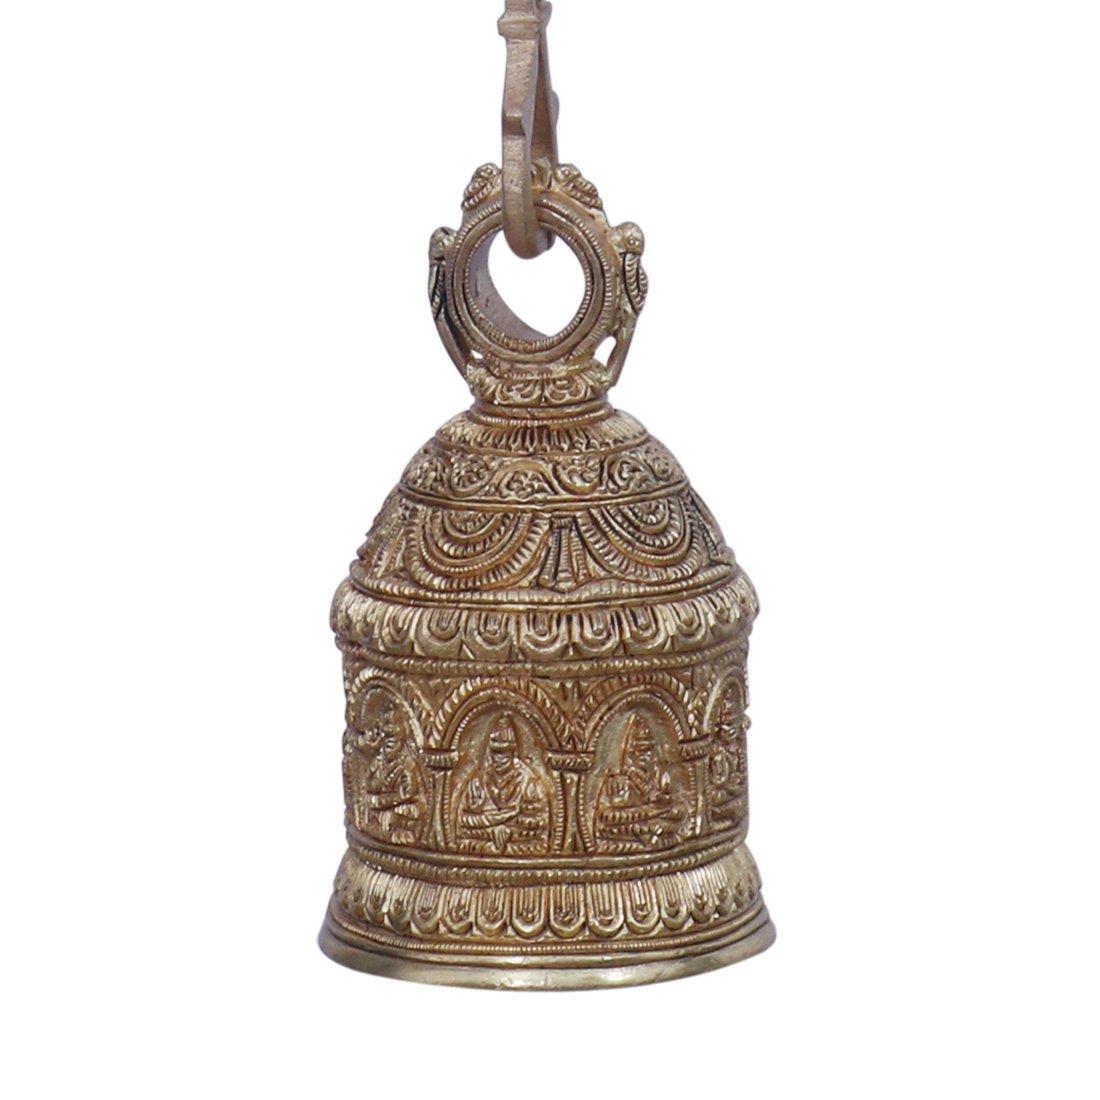 Amazon.com: Ratnatraya Indian Small Brass Bell Hanging For Pooja ...